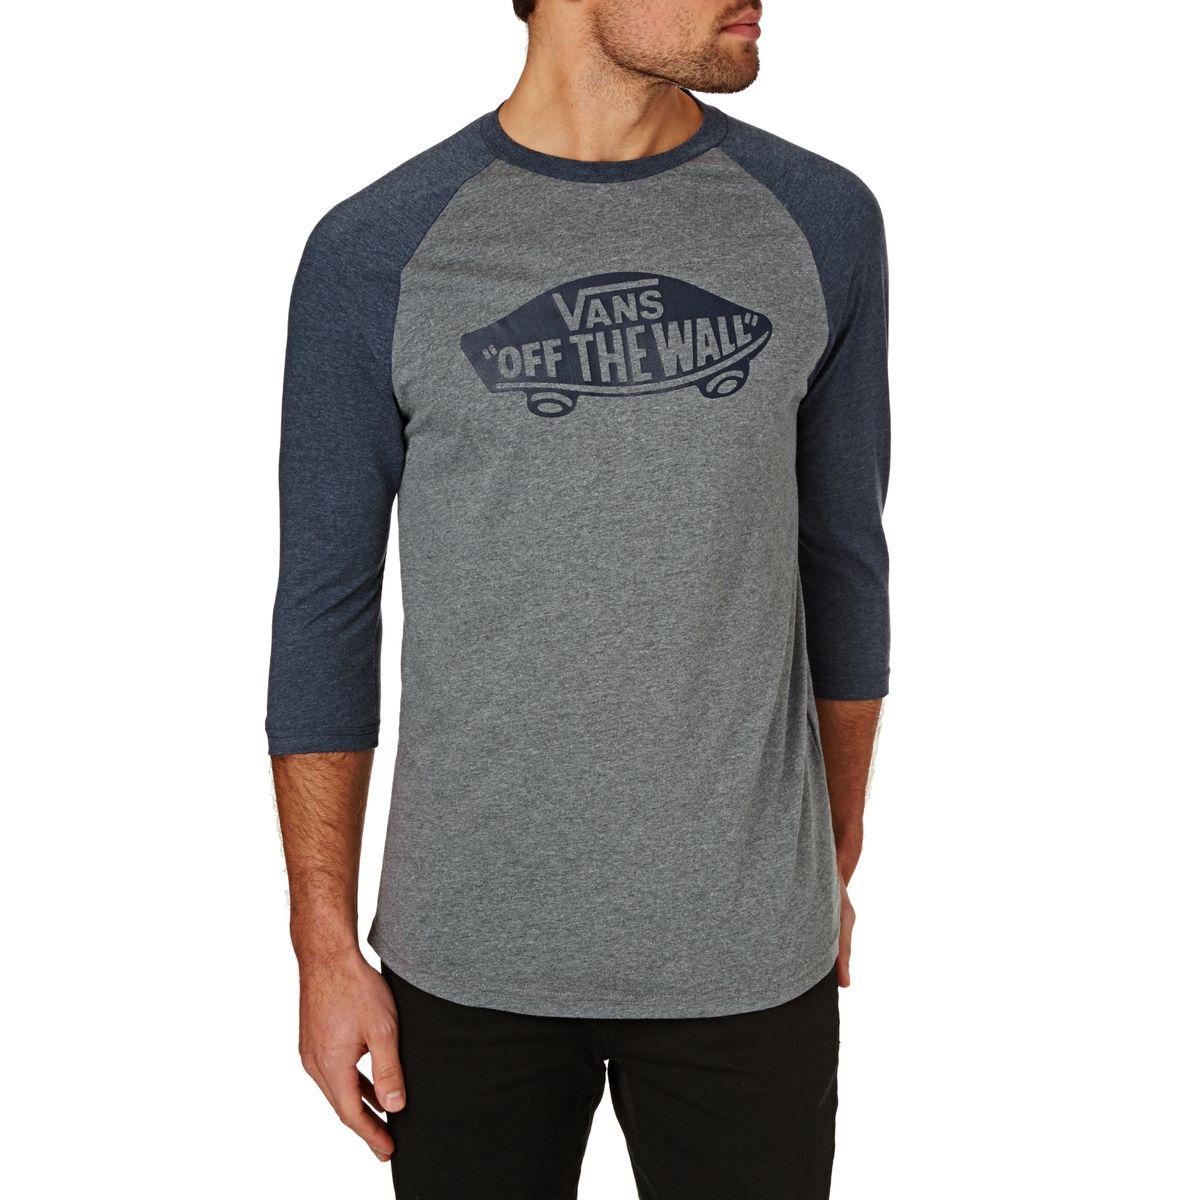 Vans OTW T-Shirt £21.75 @ Surfdome